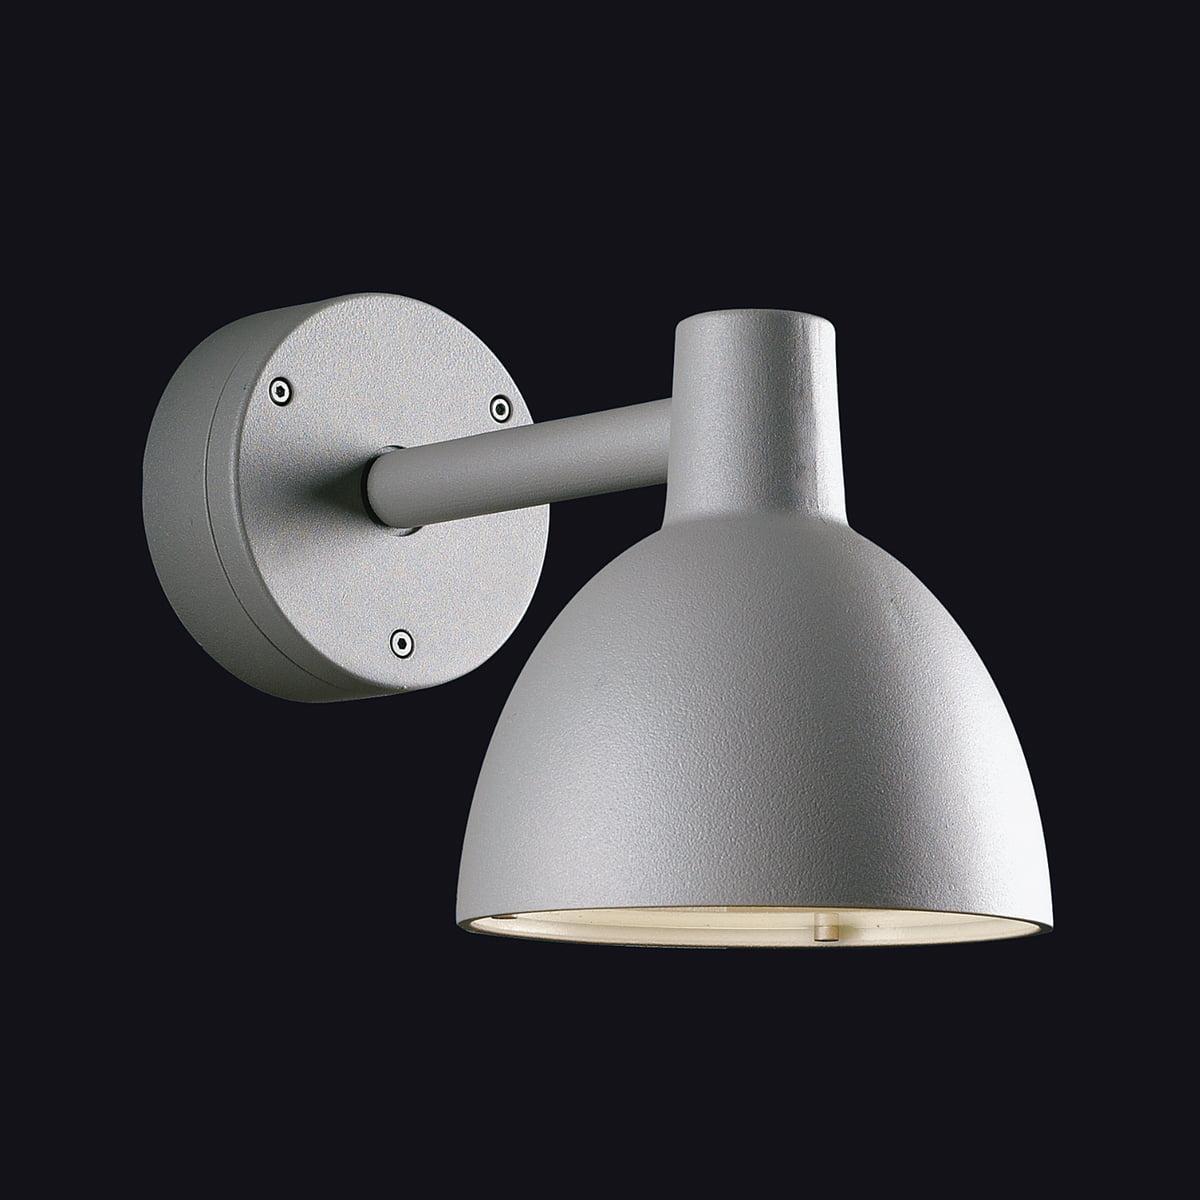 toldbod 155 wall lamp by louis poulsen. Black Bedroom Furniture Sets. Home Design Ideas